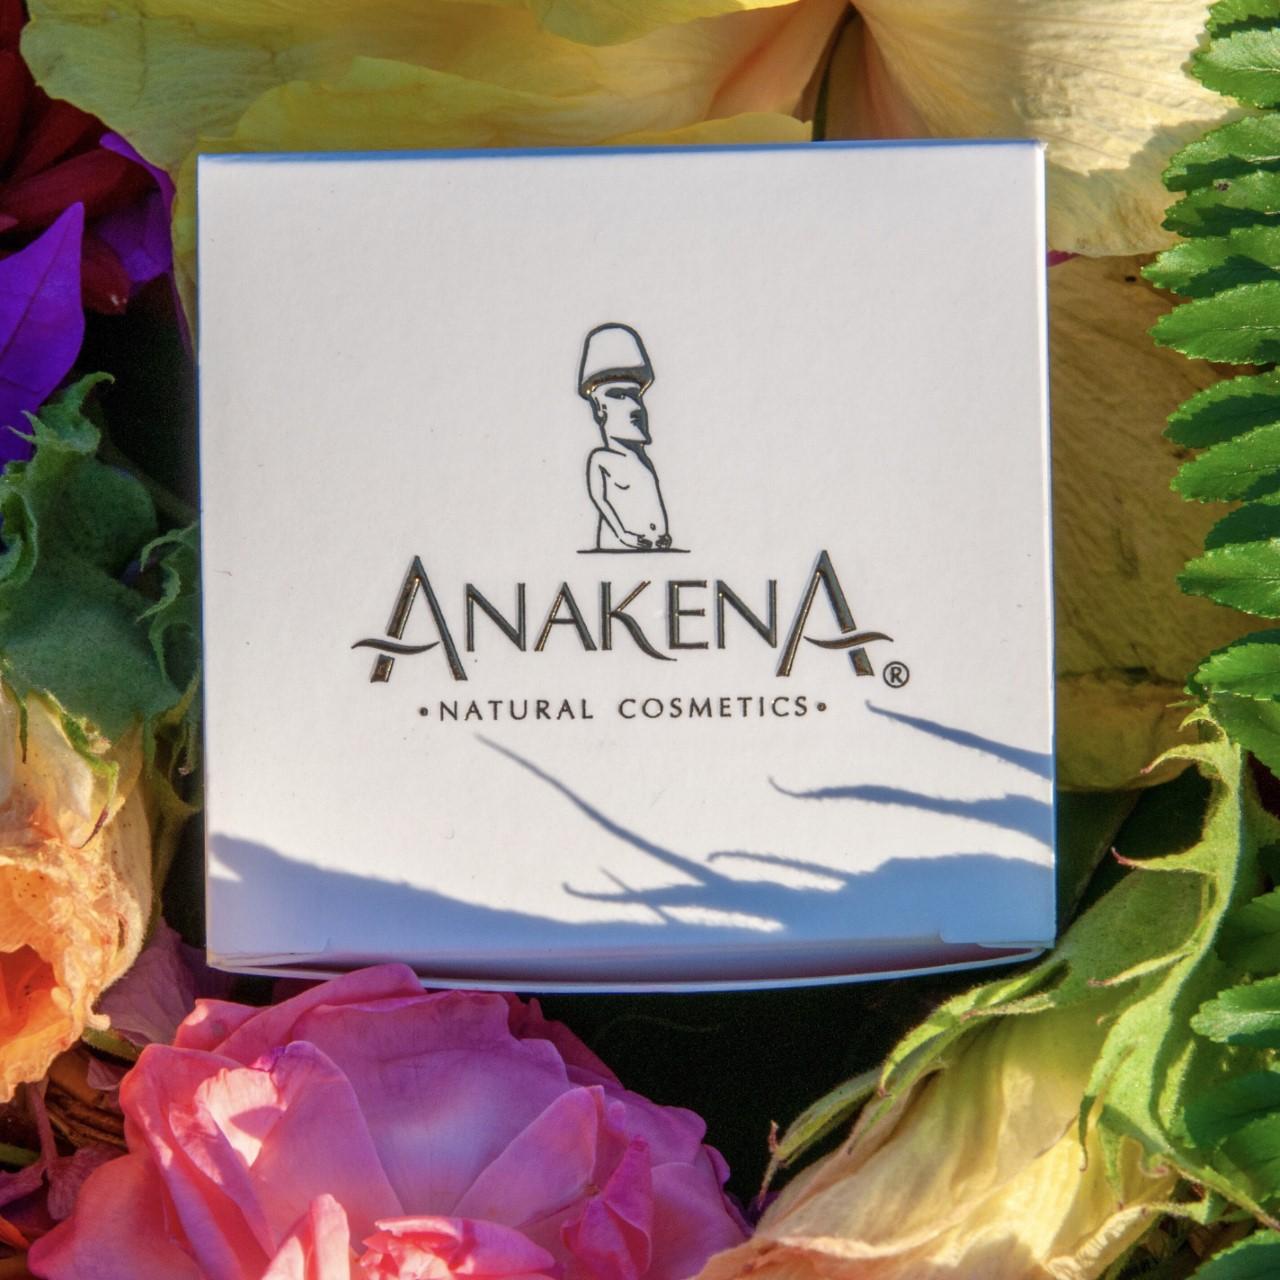 ¿Qué representael logo de Anakena?